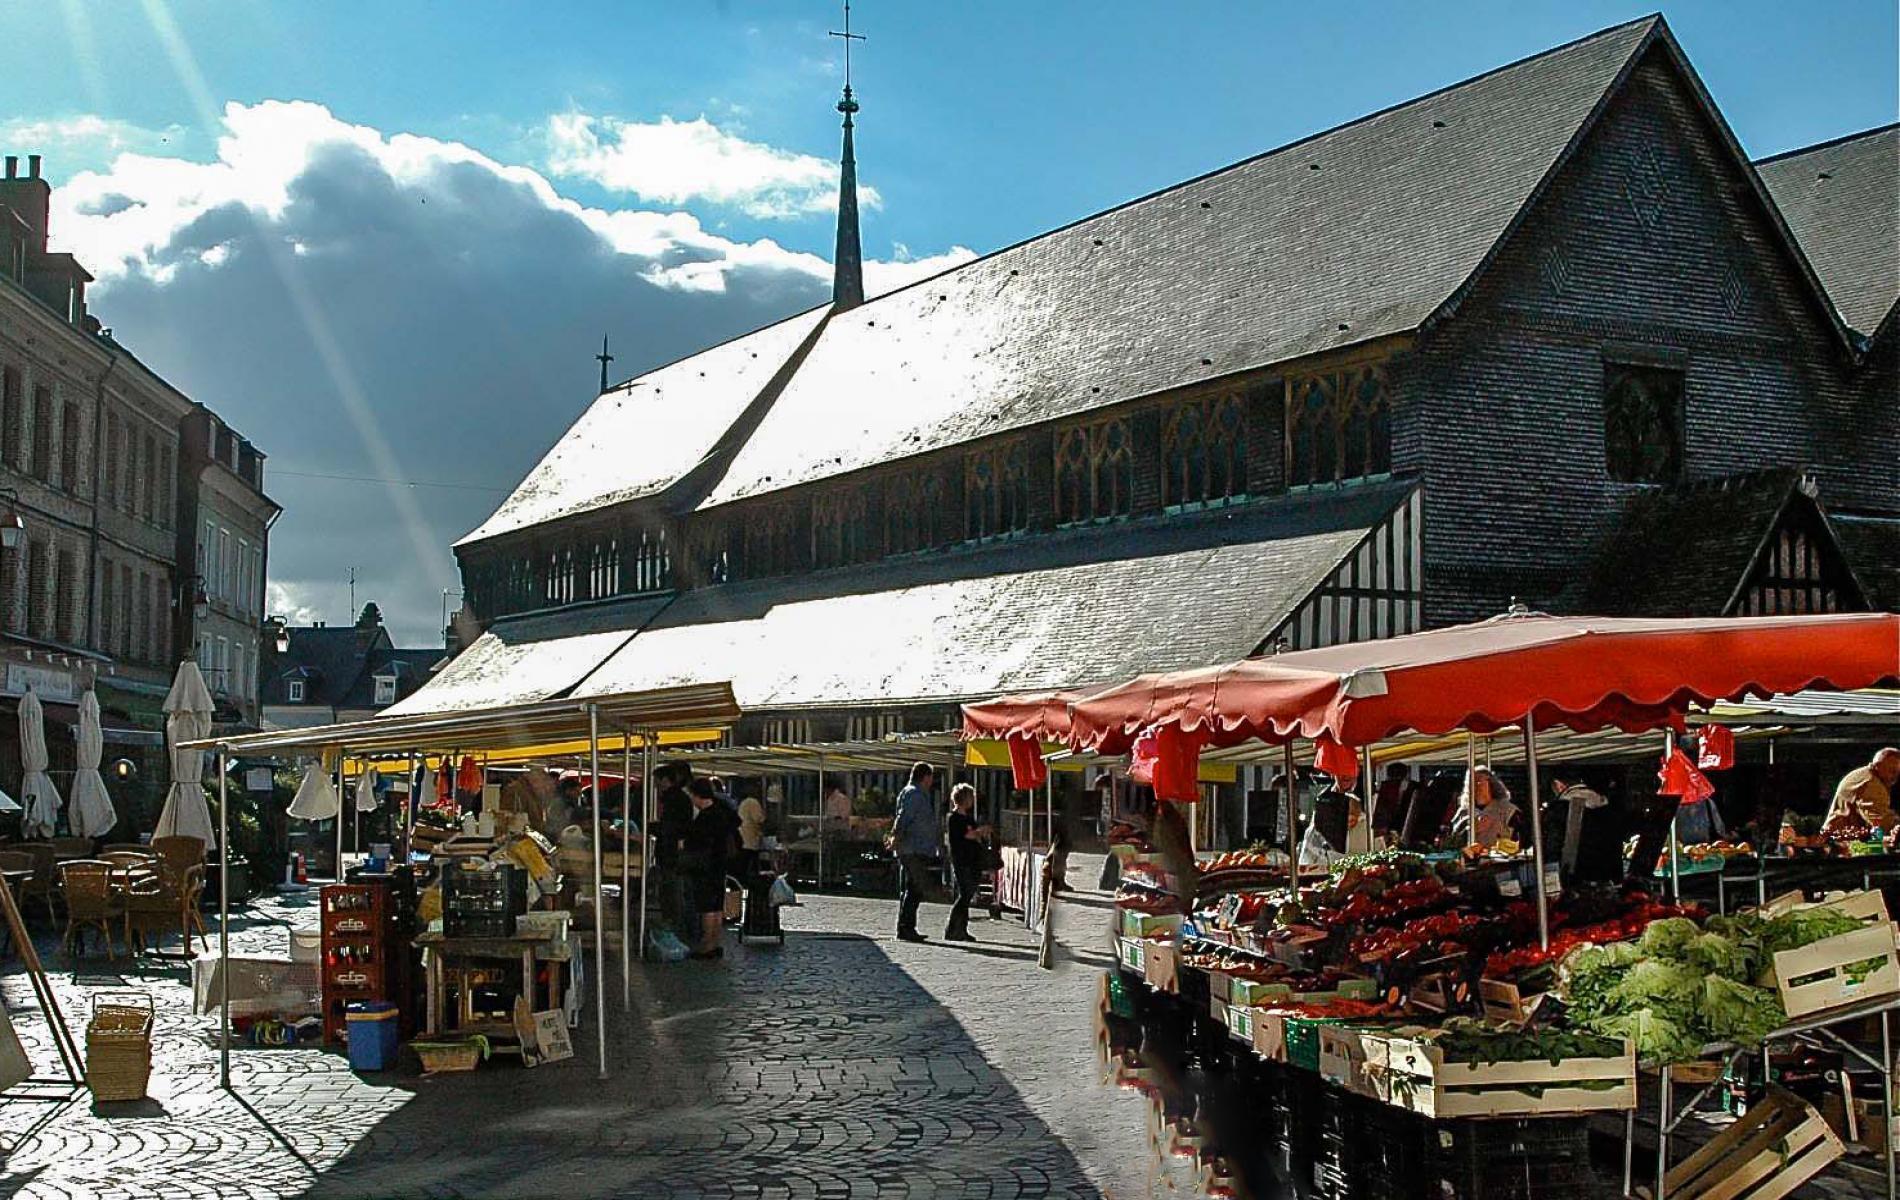 Honfleur's traditional market